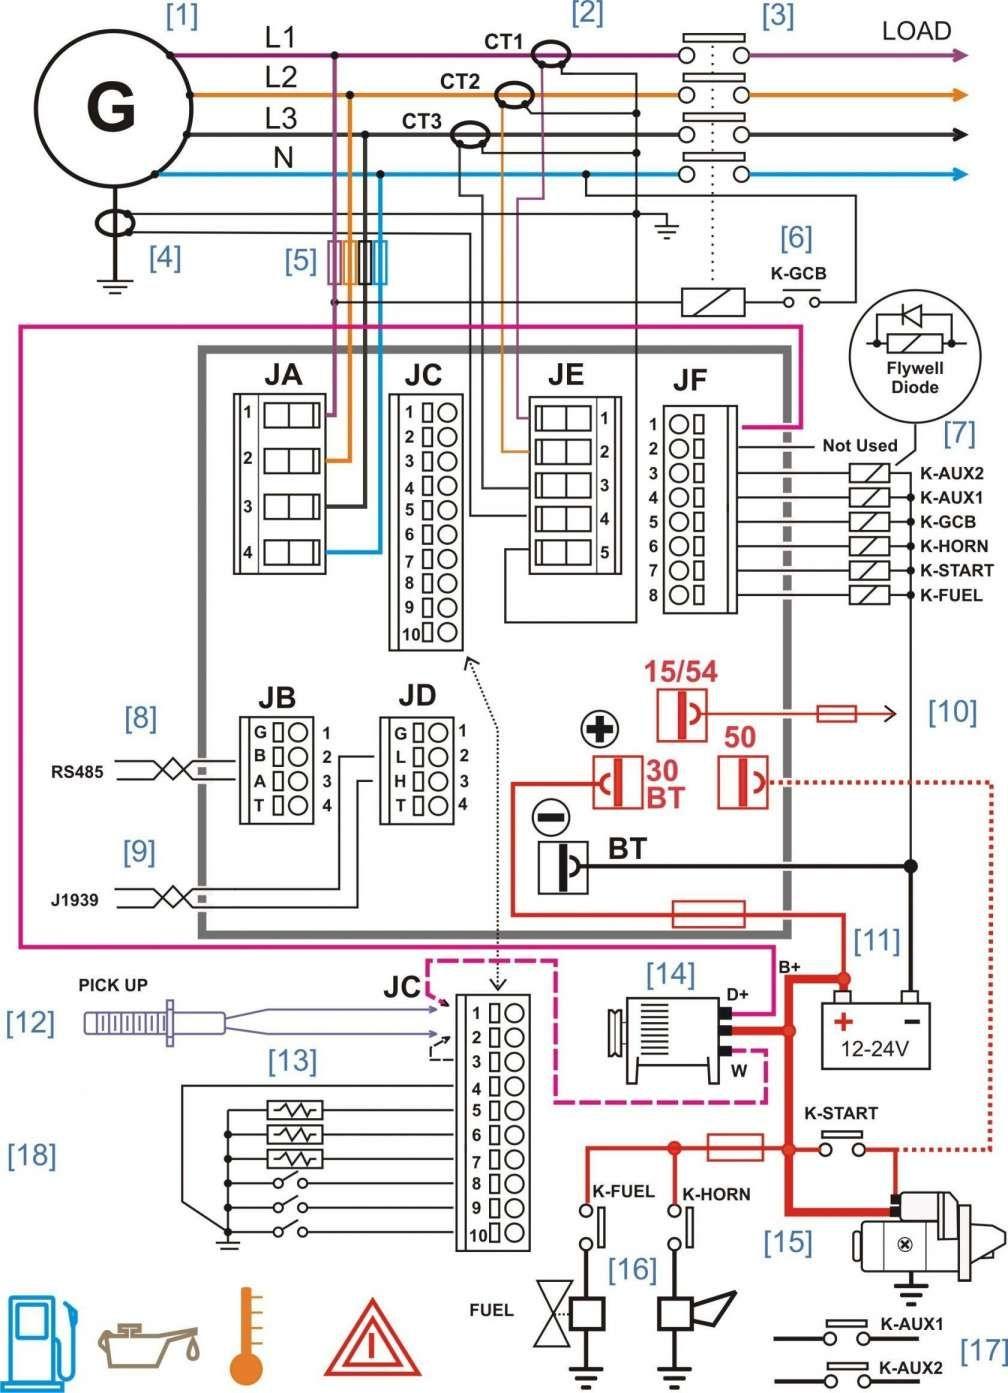 16+ Blaupunkt Car Stereo Wiring Diagram - Car Diagram - Wiringg.net in 2020  | Electrical circuit diagram, Electrical wiring diagram, Diagram designPinterest